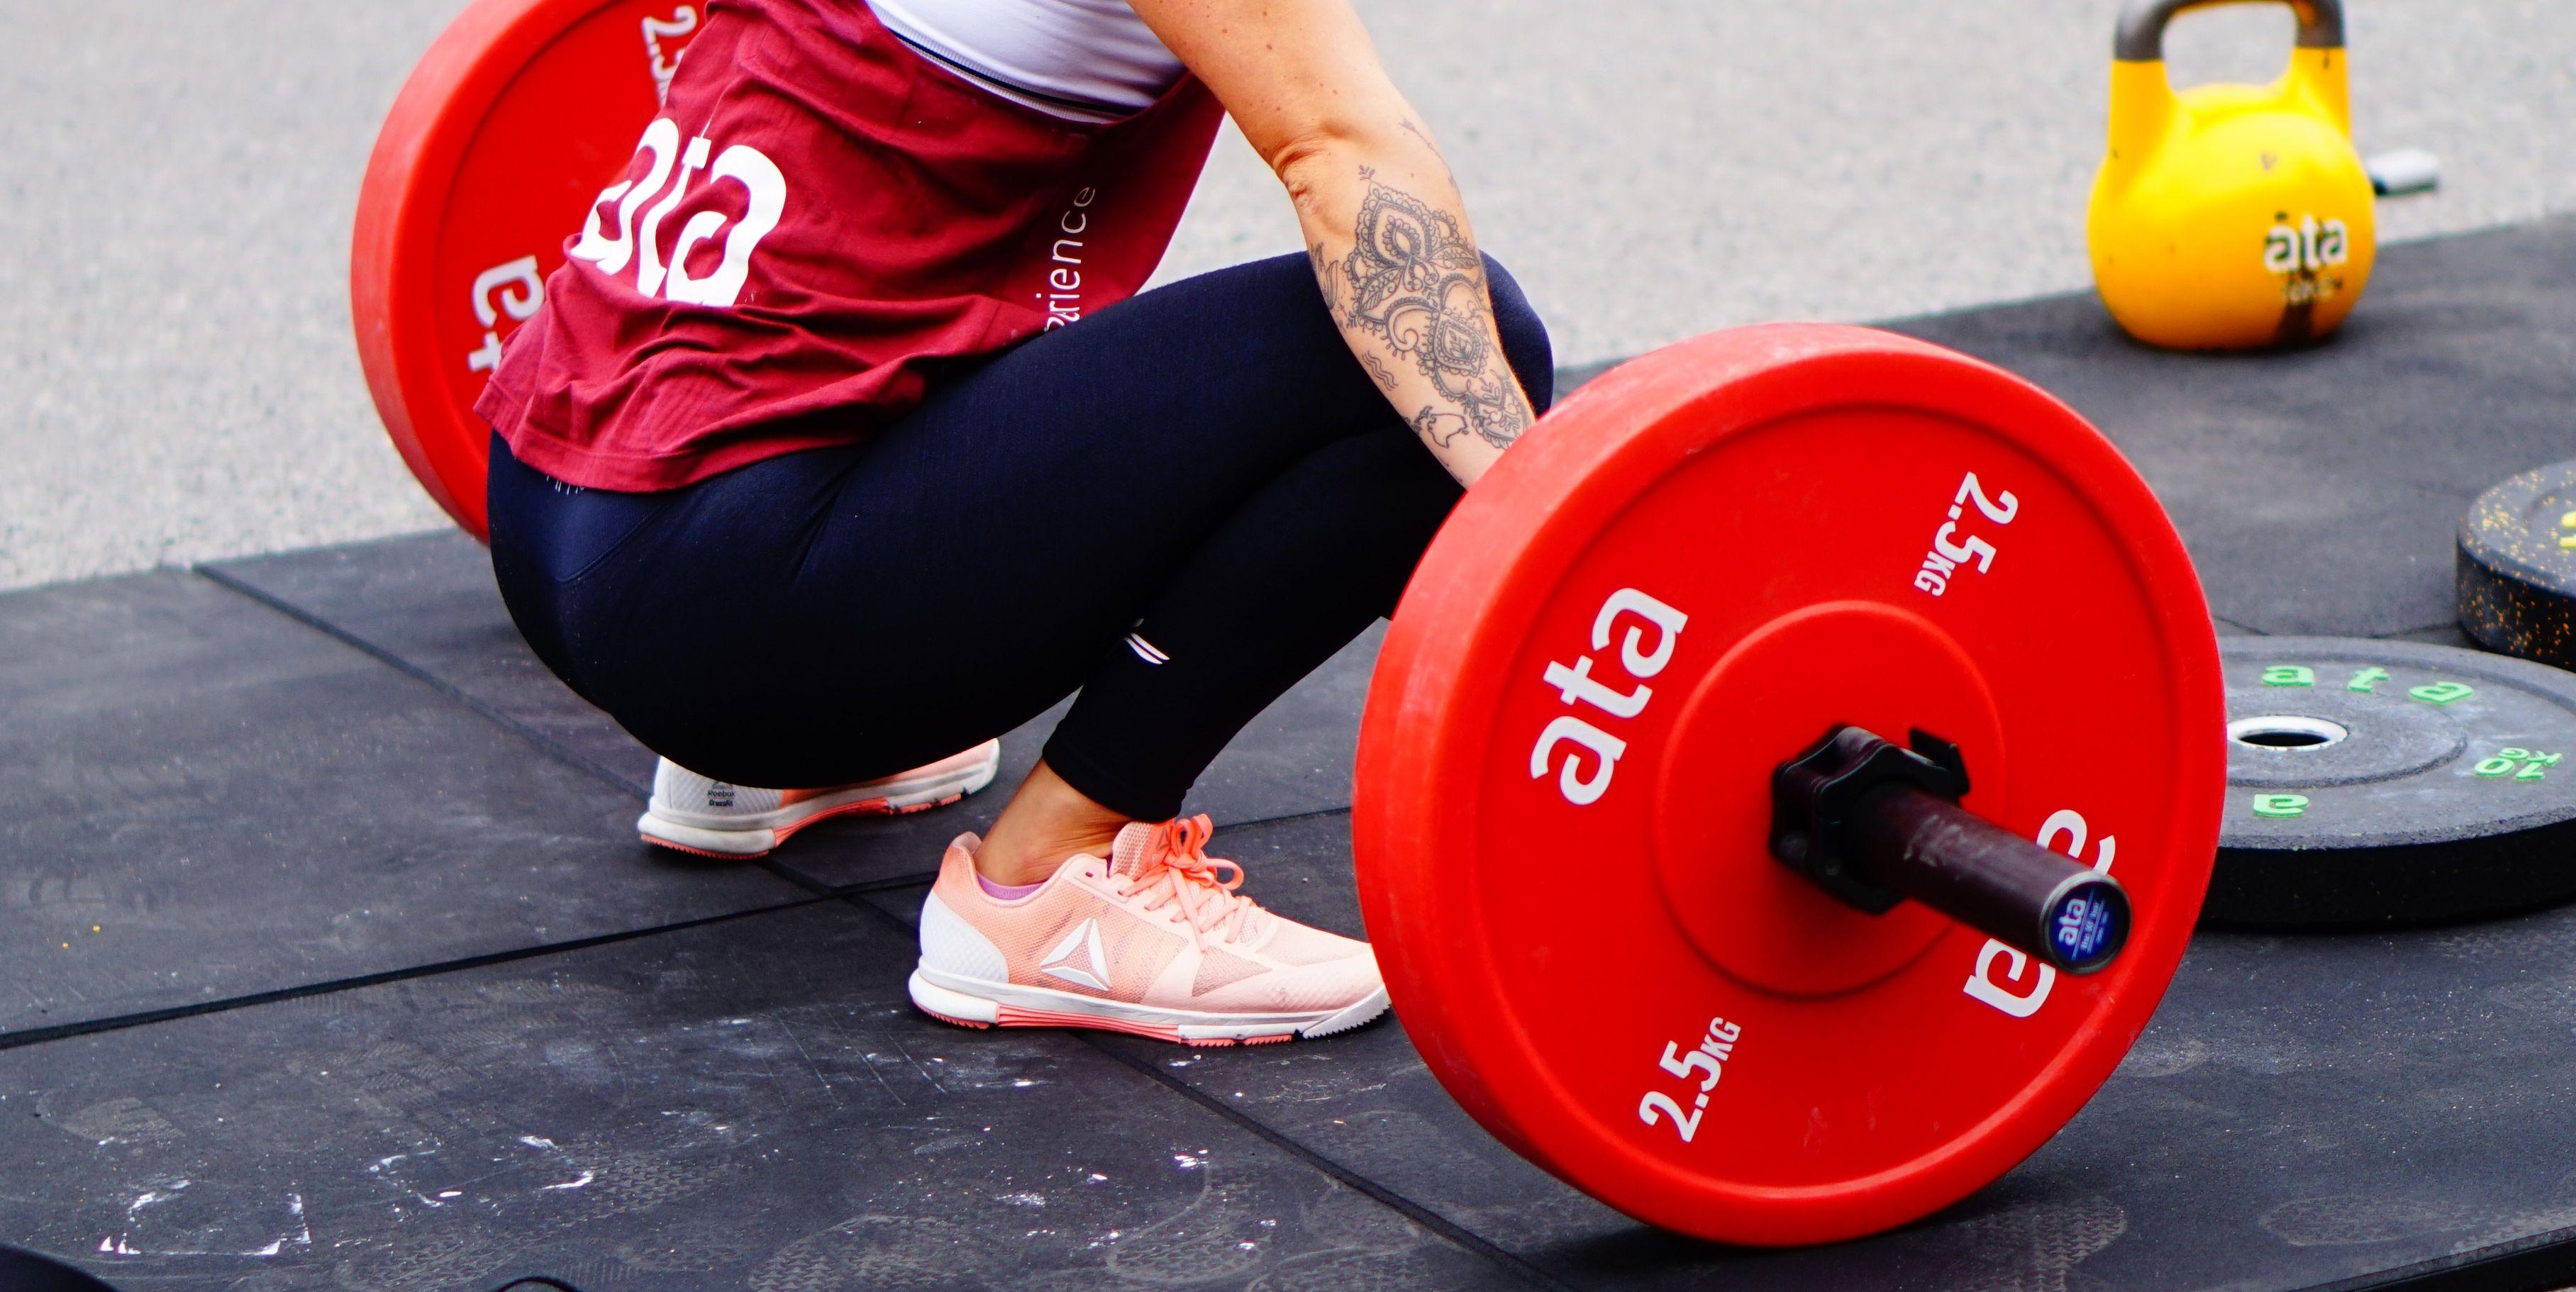 Best strength training equipment